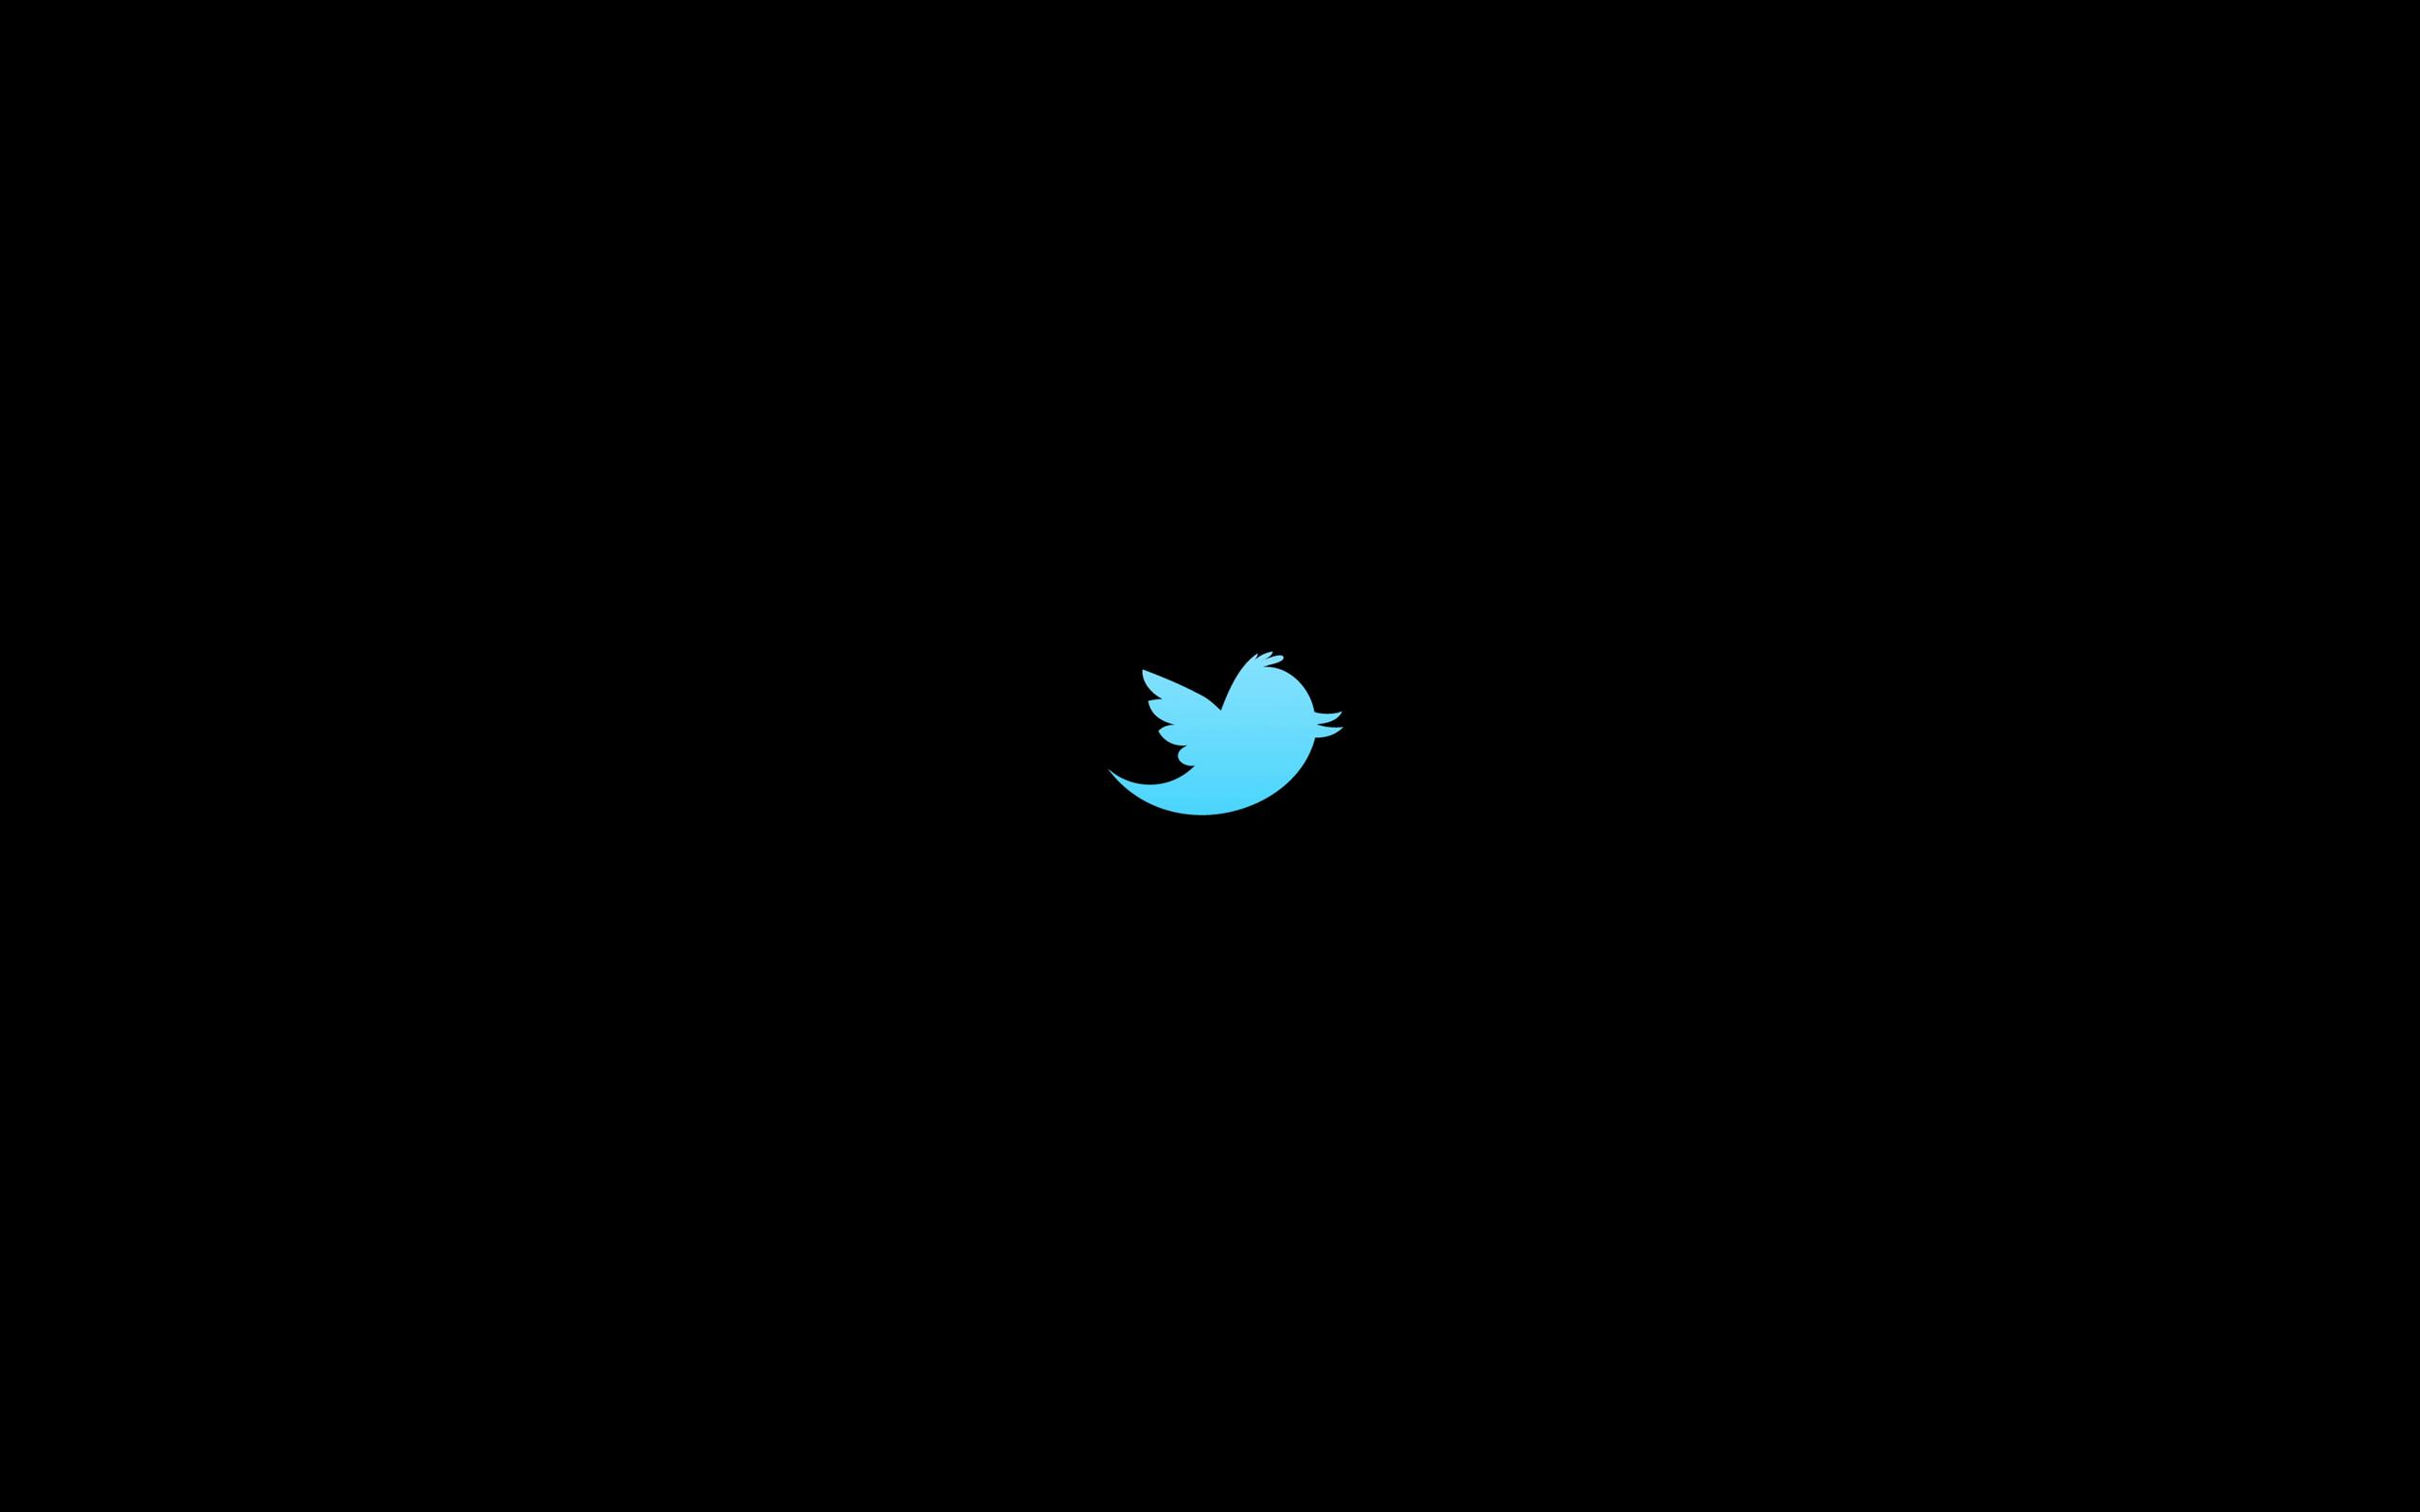 Twitter Wallpaper 3